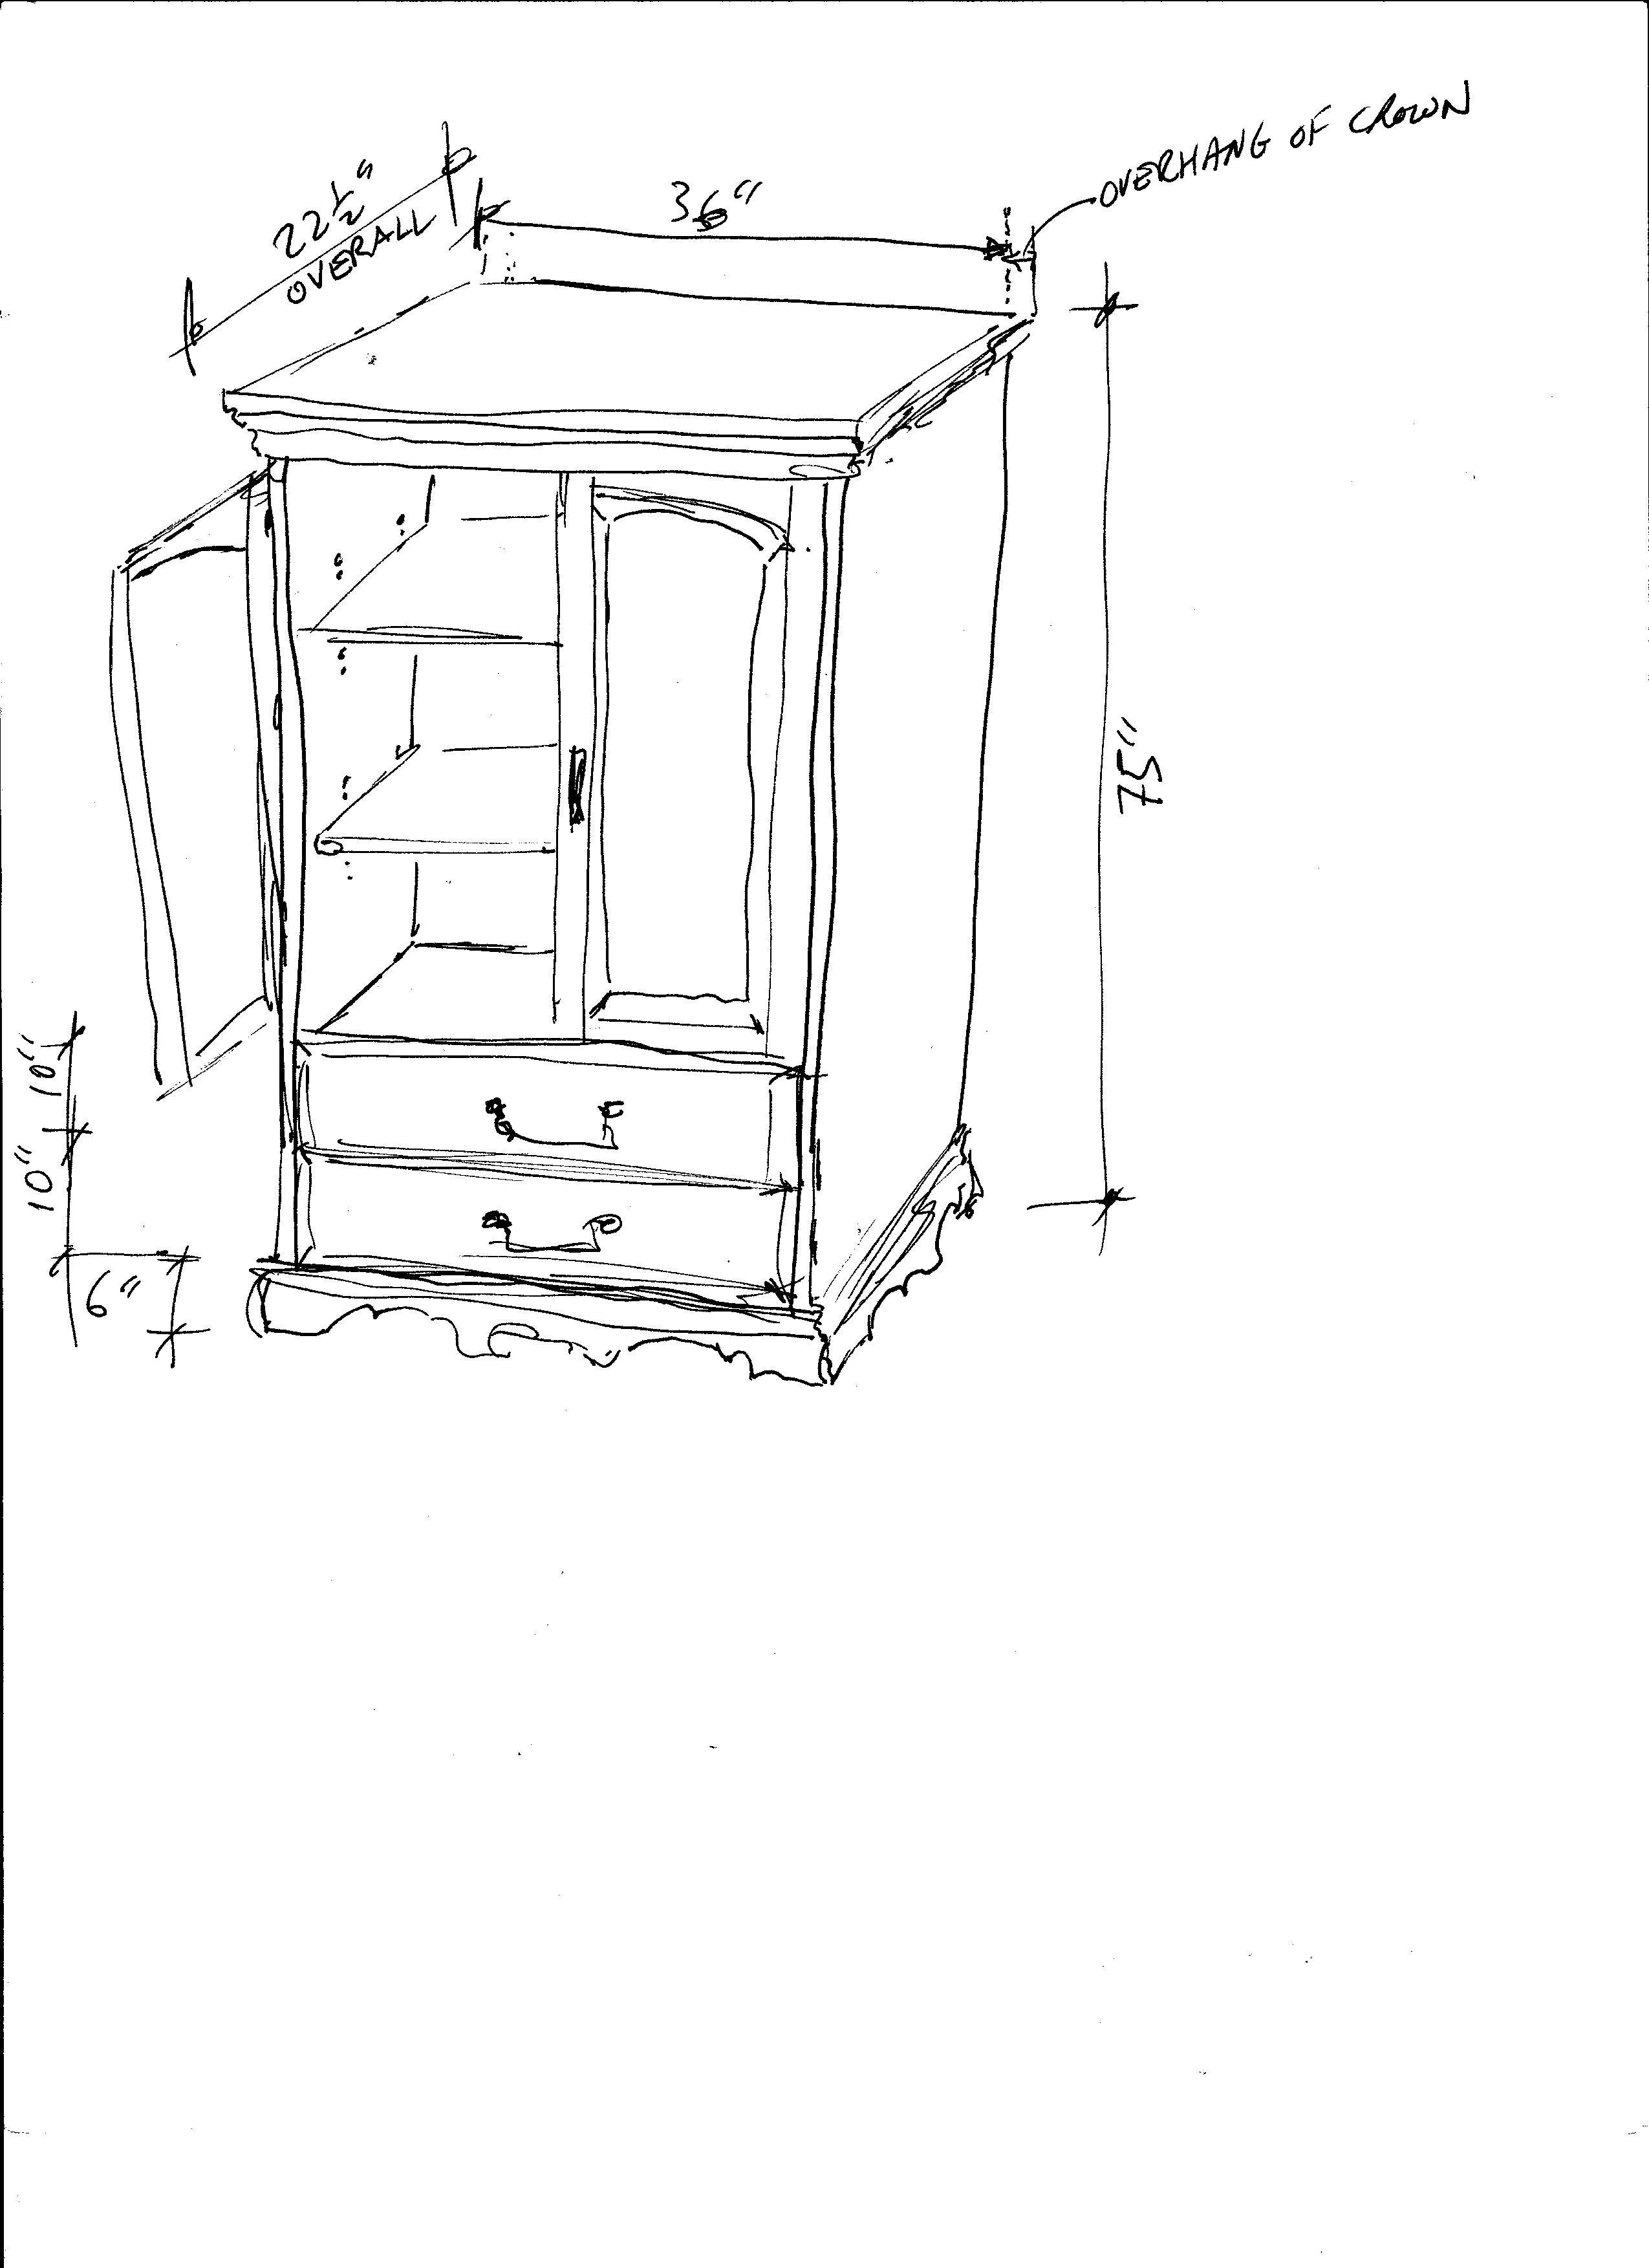 https://0901.nccdn.net/4_2/000/000/06b/a1b/Bolton-armoire-sketch-2550x3507.jpg